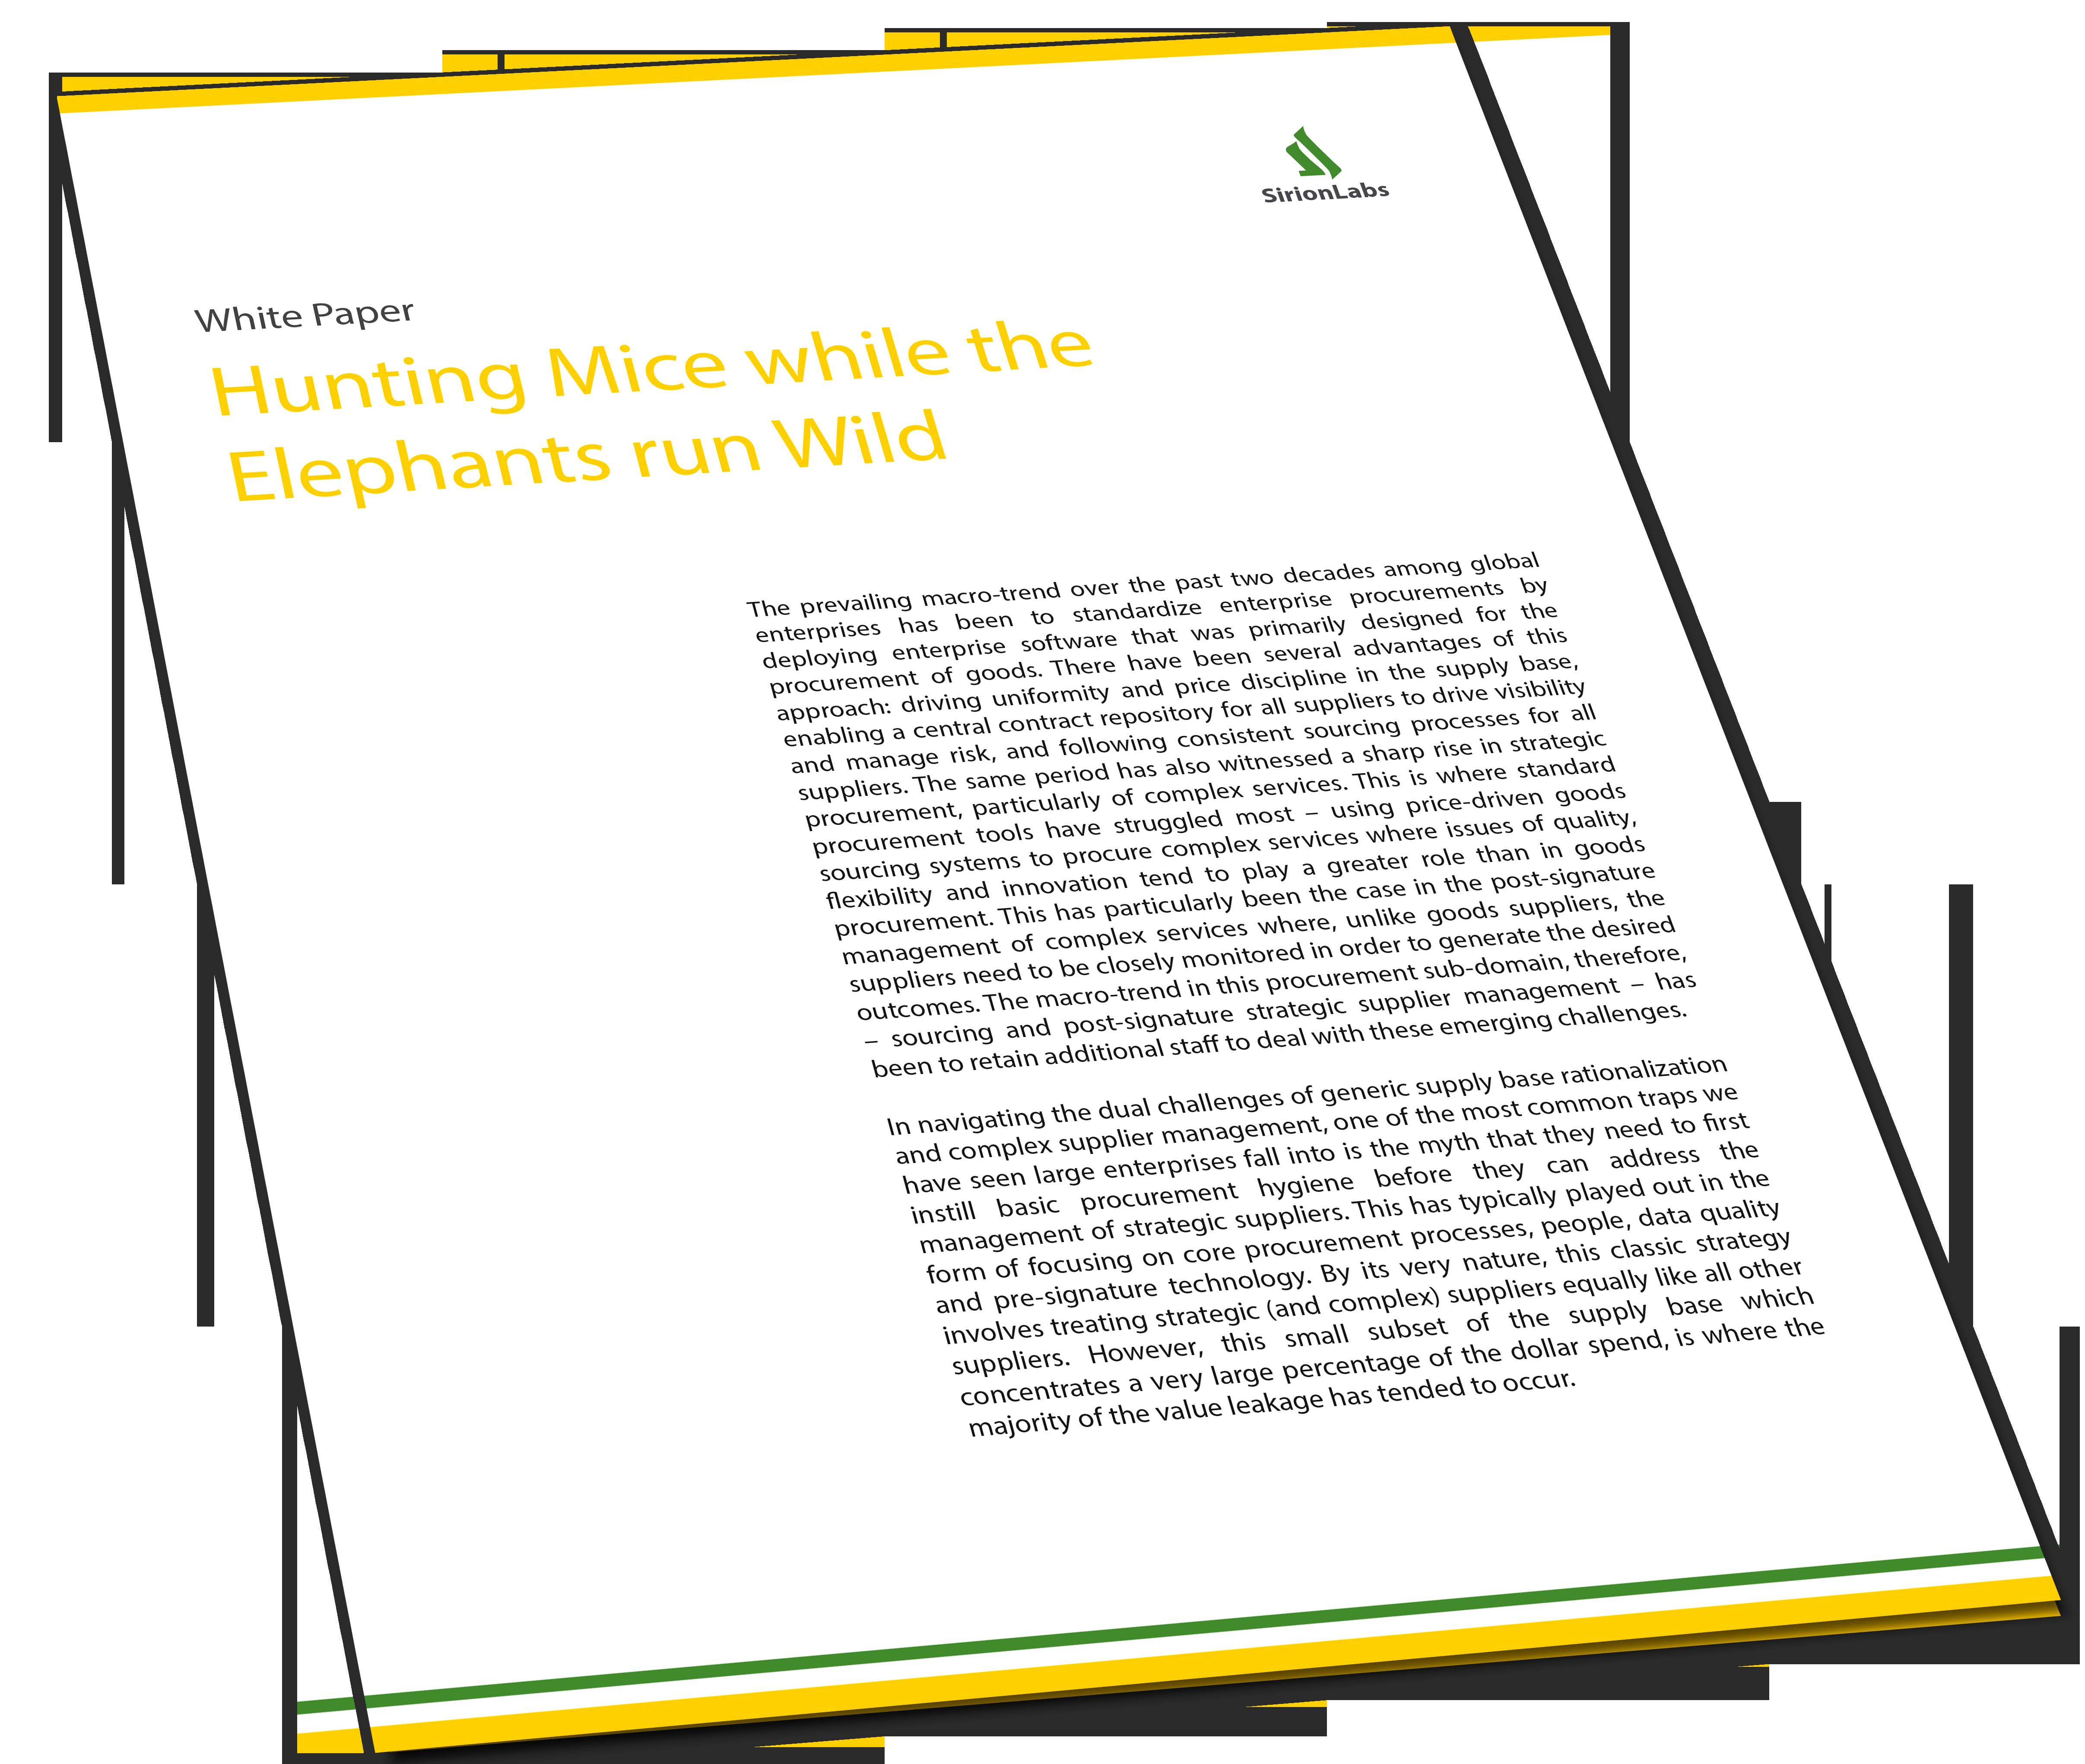 Whitepaper - Hunting Mice while the Elephants run Wild